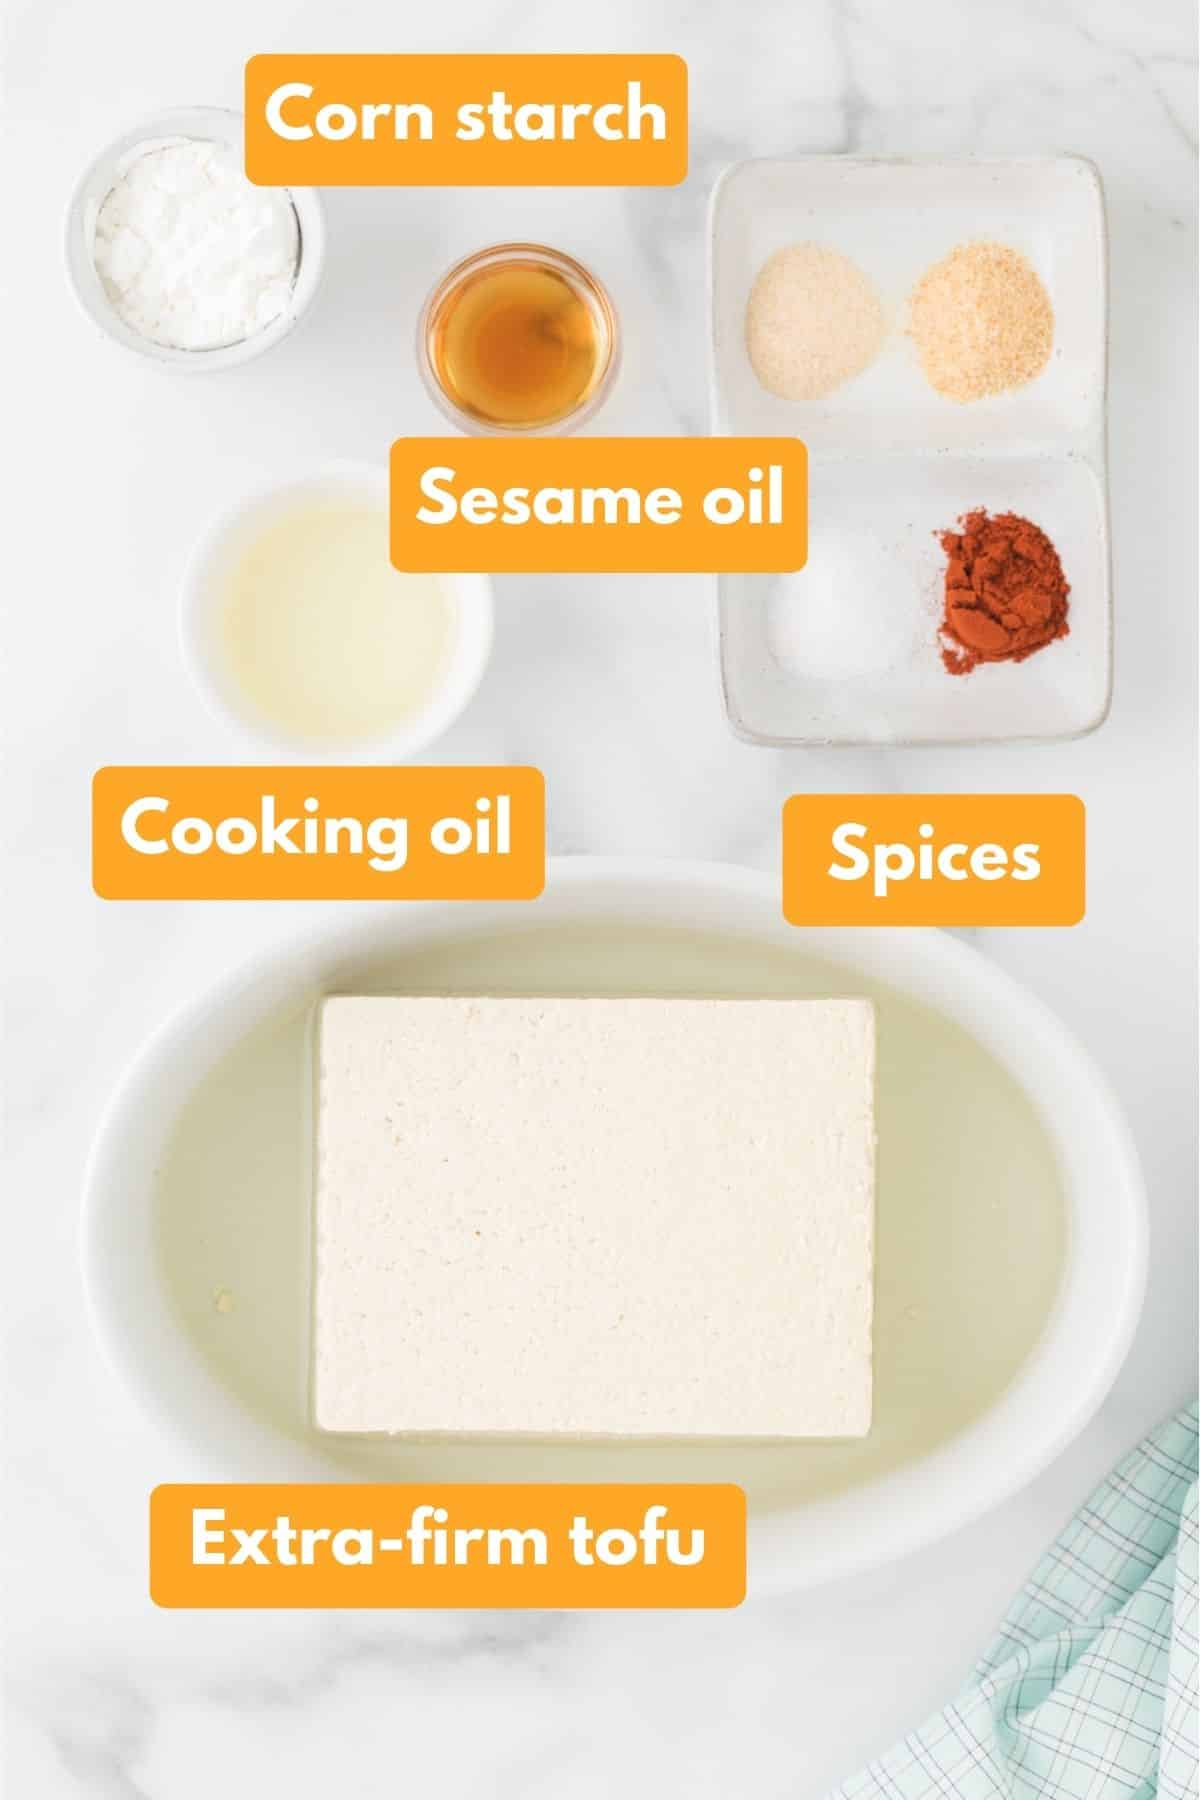 ingredients for crispy tofu